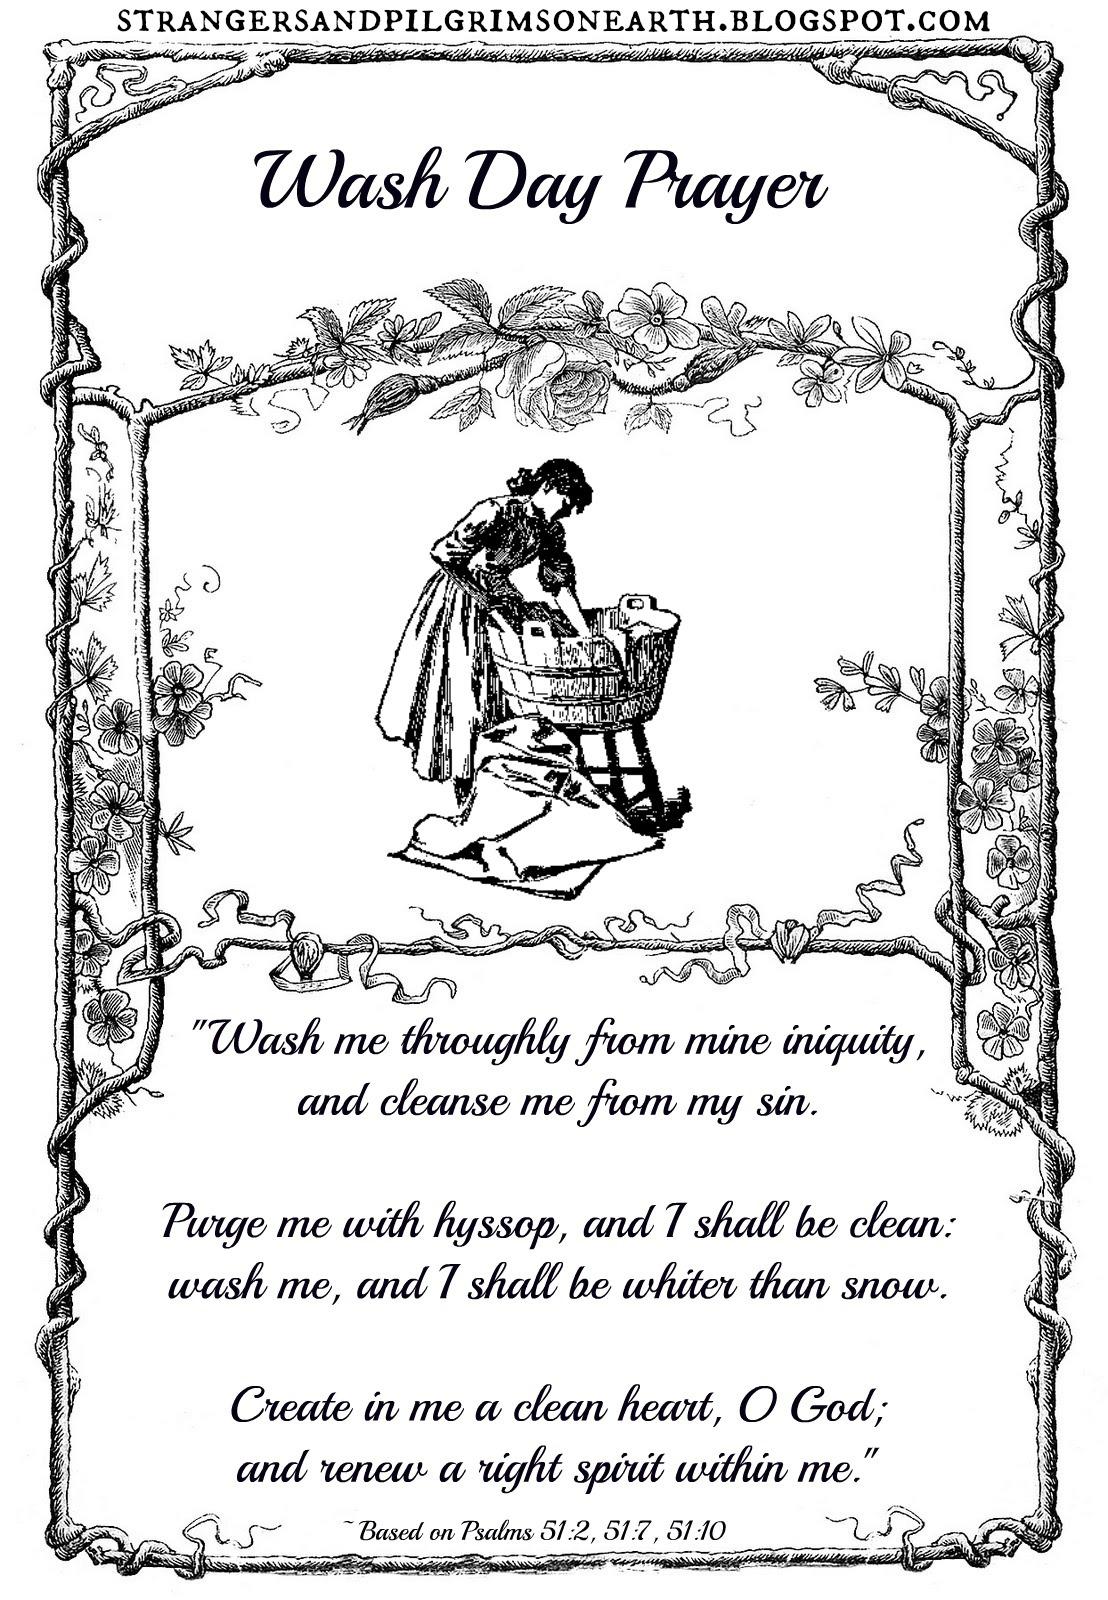 Strangers Amp Pilgrims On Earth Wash Day Prayer Free Inspirational Printable